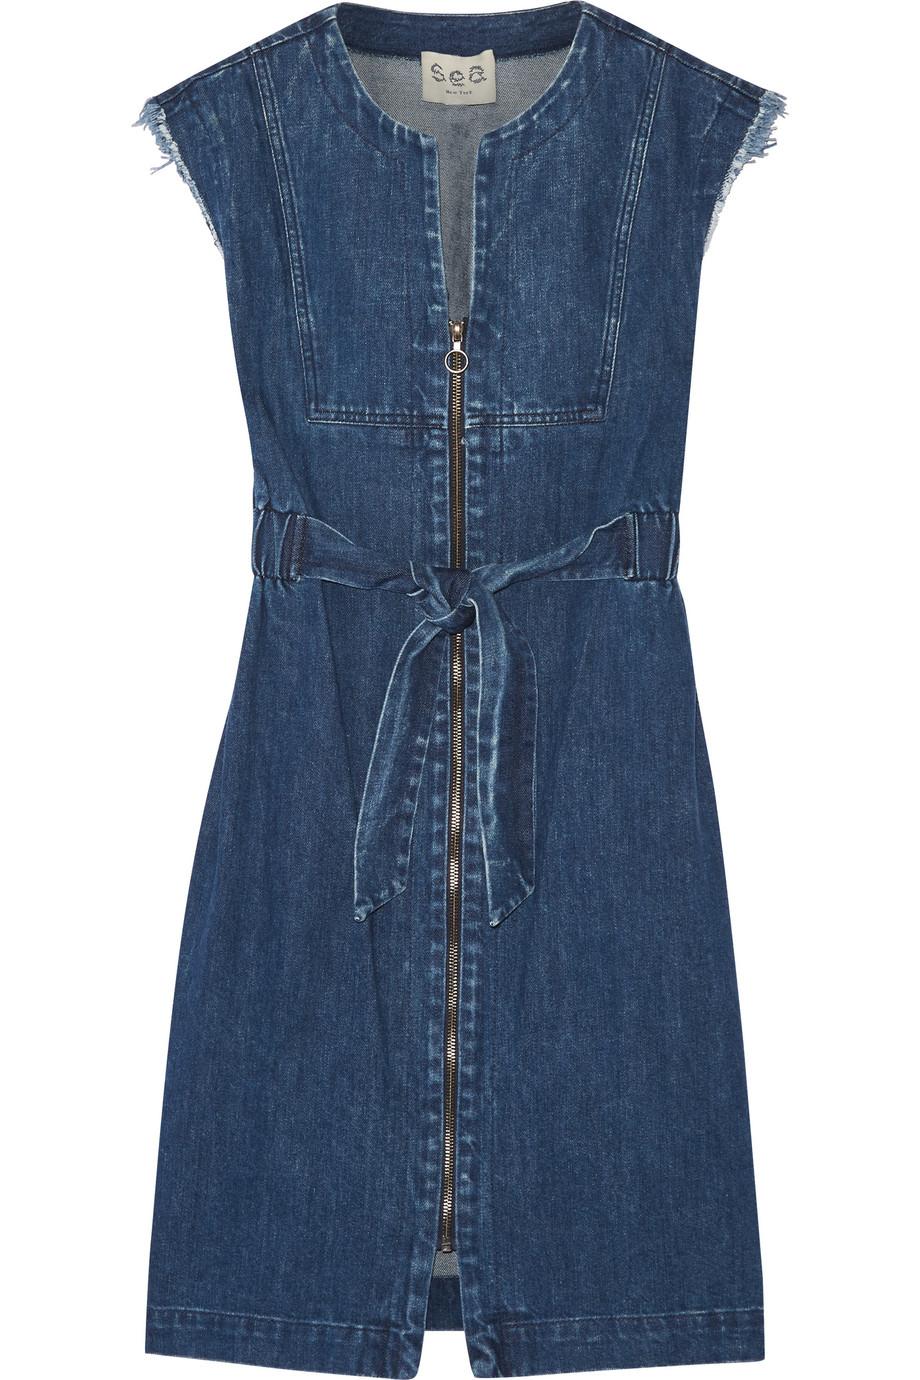 SEA Frayed Denim Dress, Indigo, Women's, Size: 4